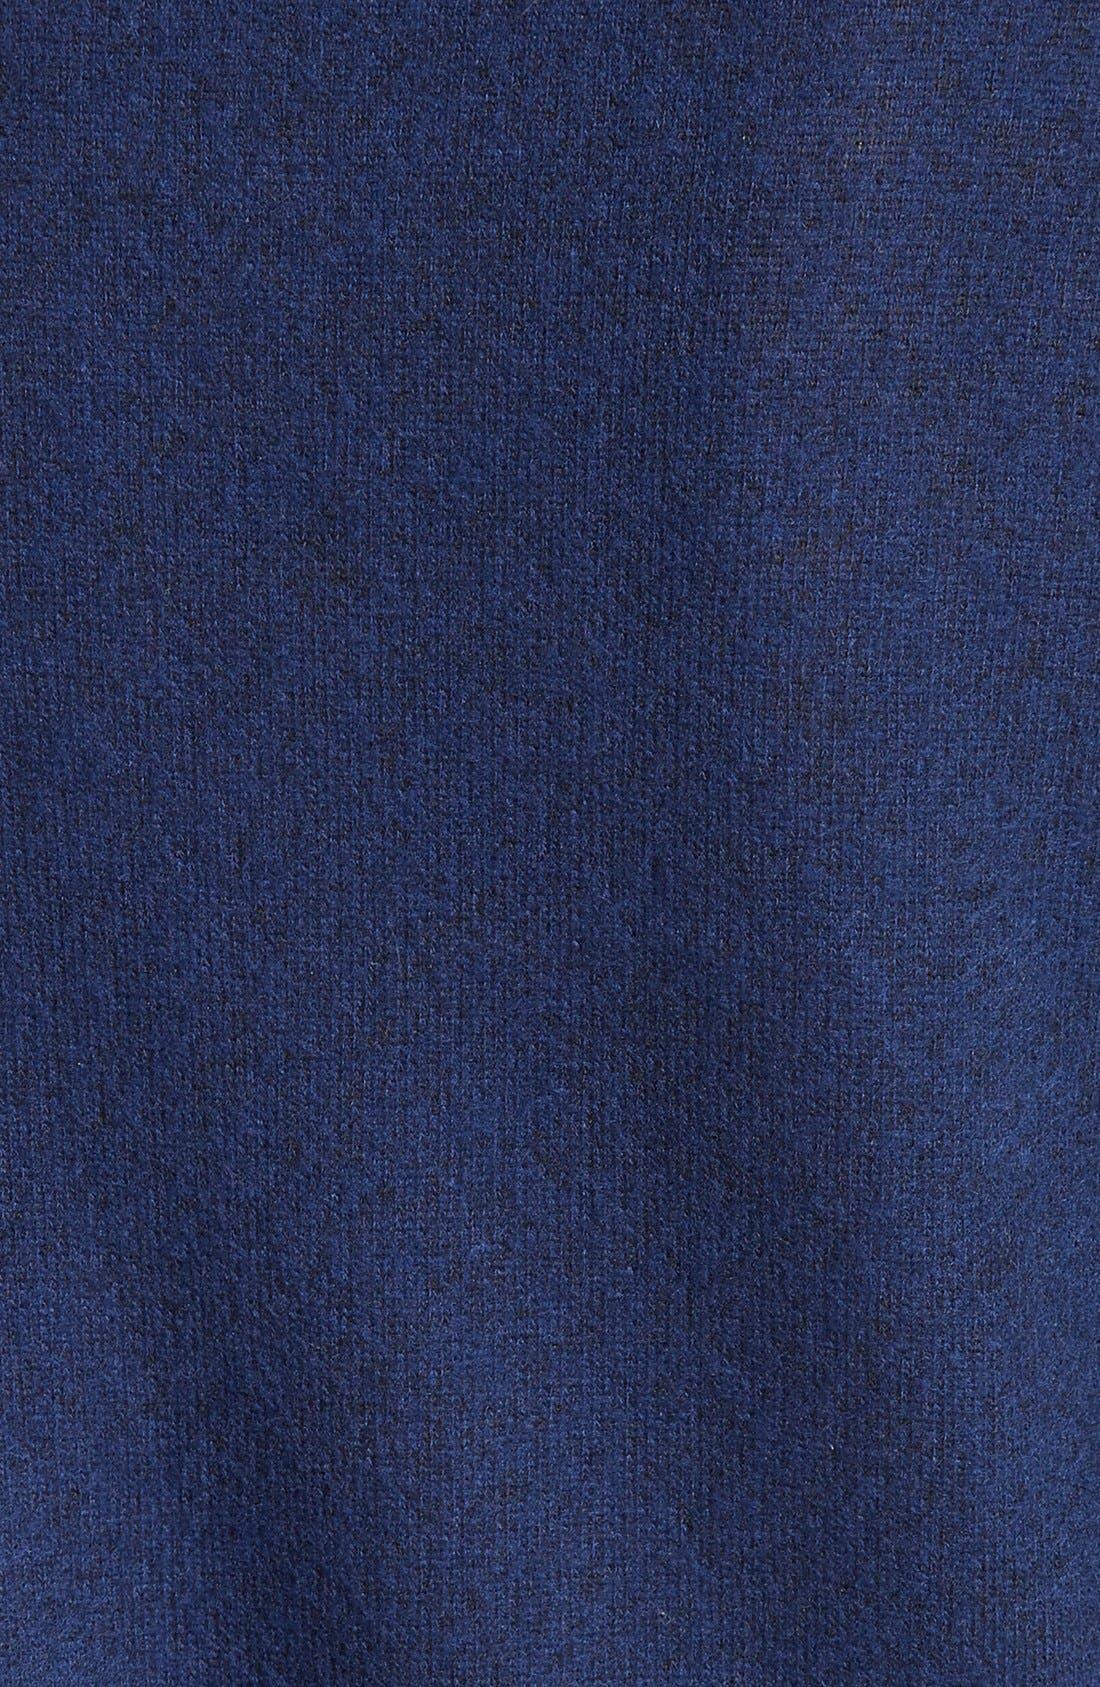 JOIE, Soft Joie Giardia Drop Shoulder Sweater, Alternate thumbnail 4, color, PEACOAT